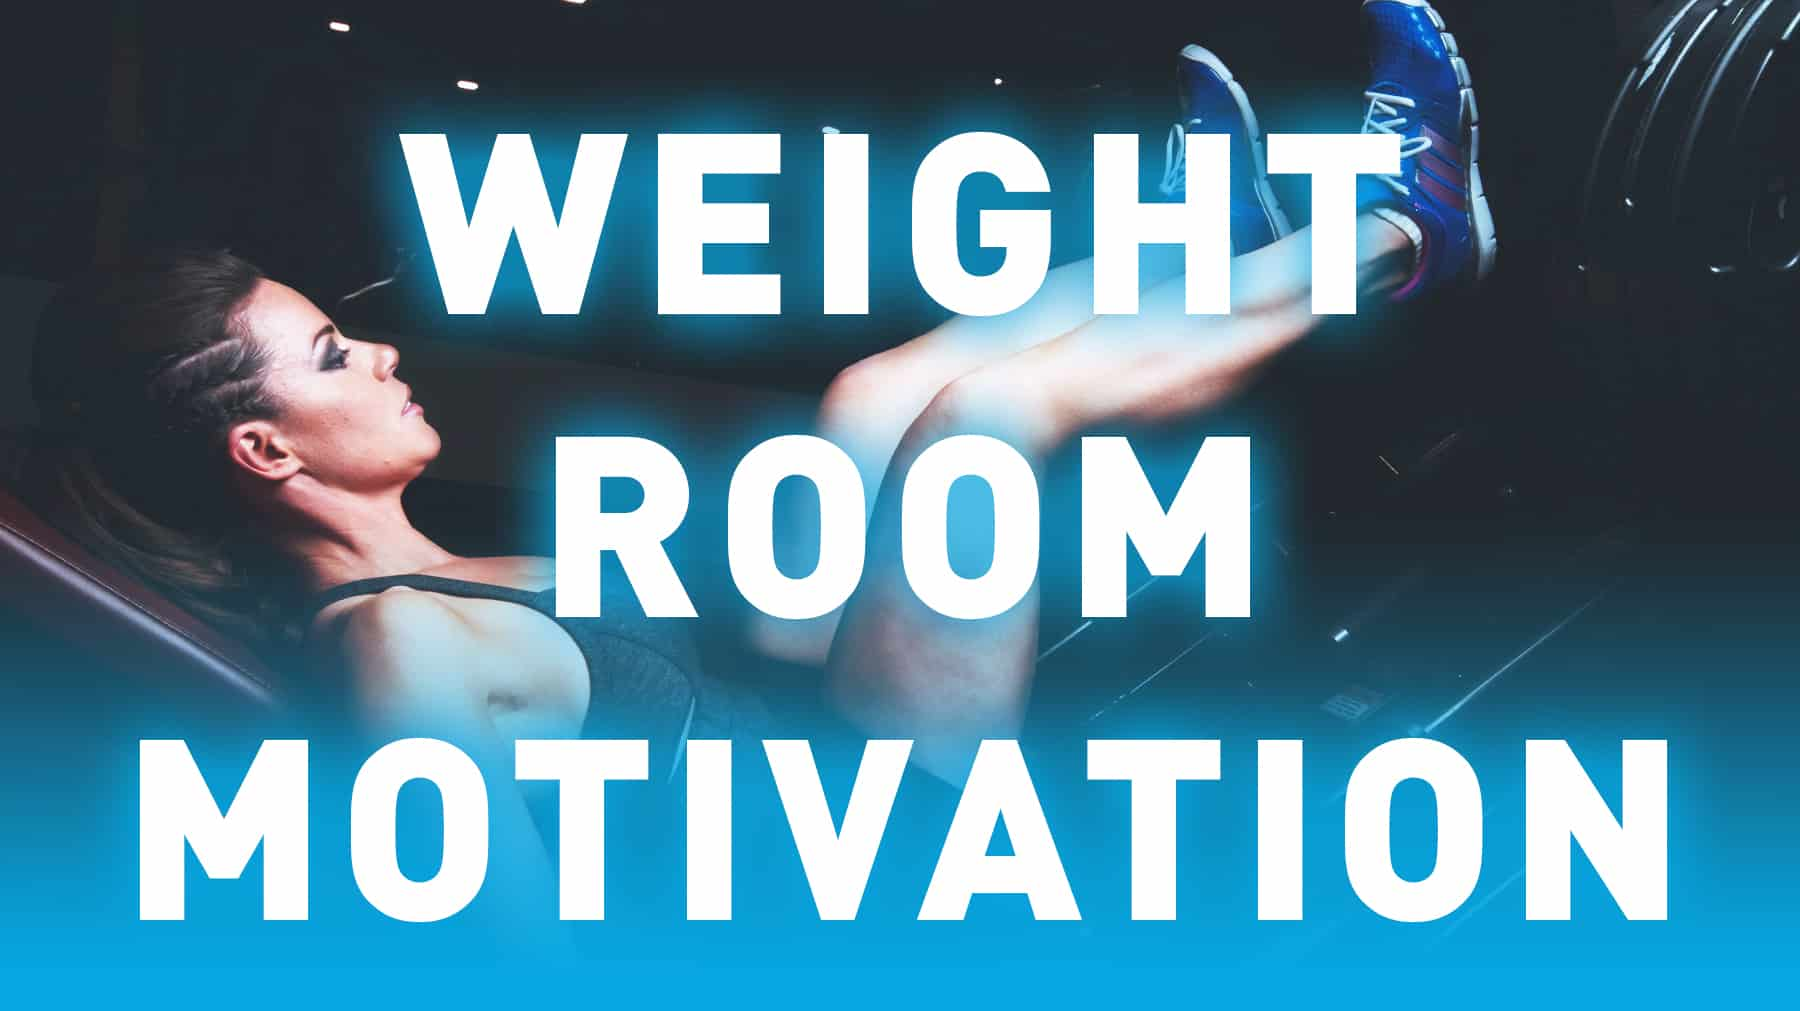 Weight room motivation